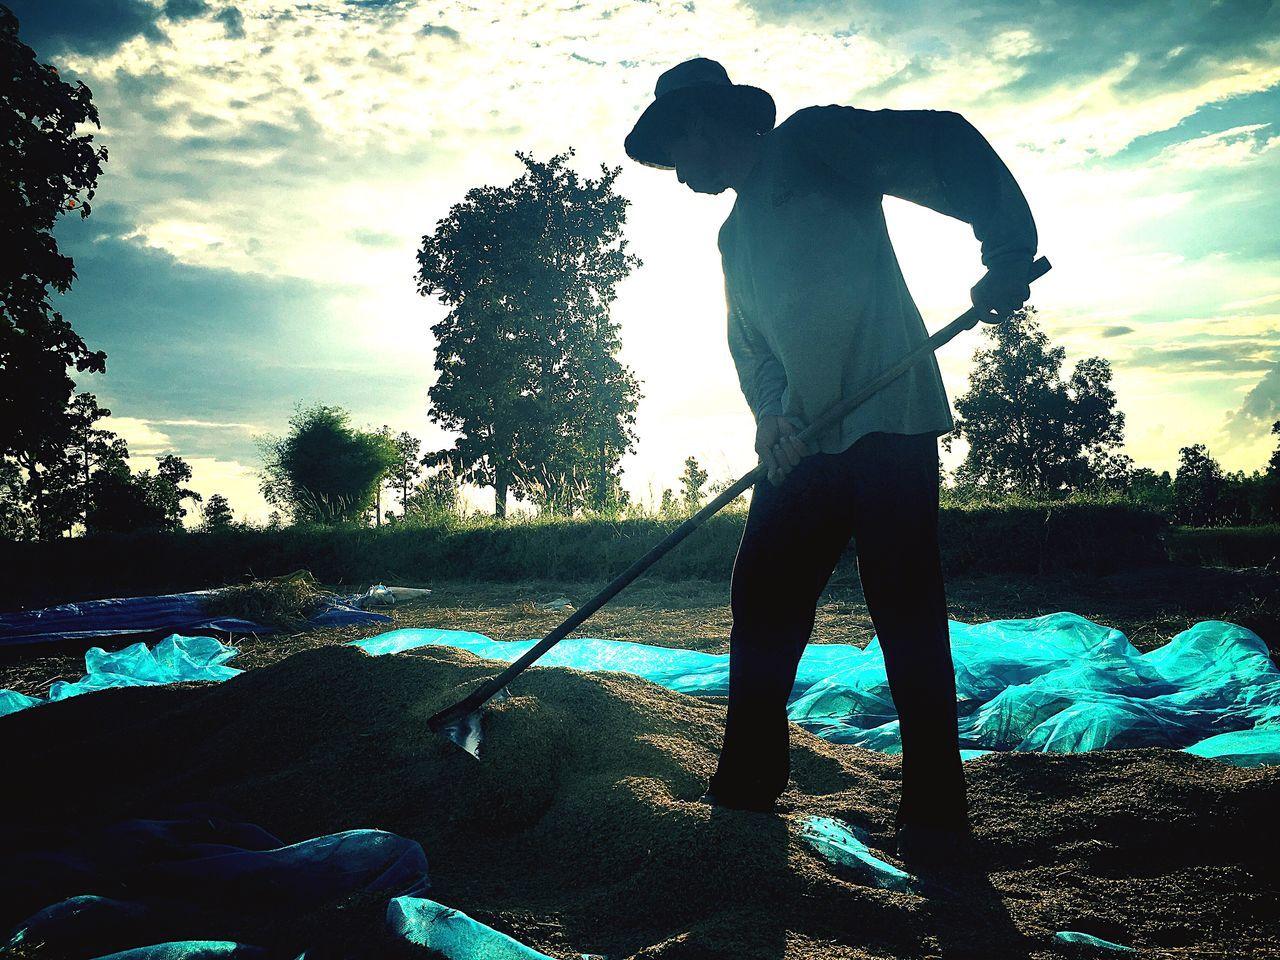 A farmer Sunlight ☀ Outdoors Silhouette Farmer Farmville Farmer's Life Working Hard Drying Paddy Rice Rice Paddy Thai Farmer